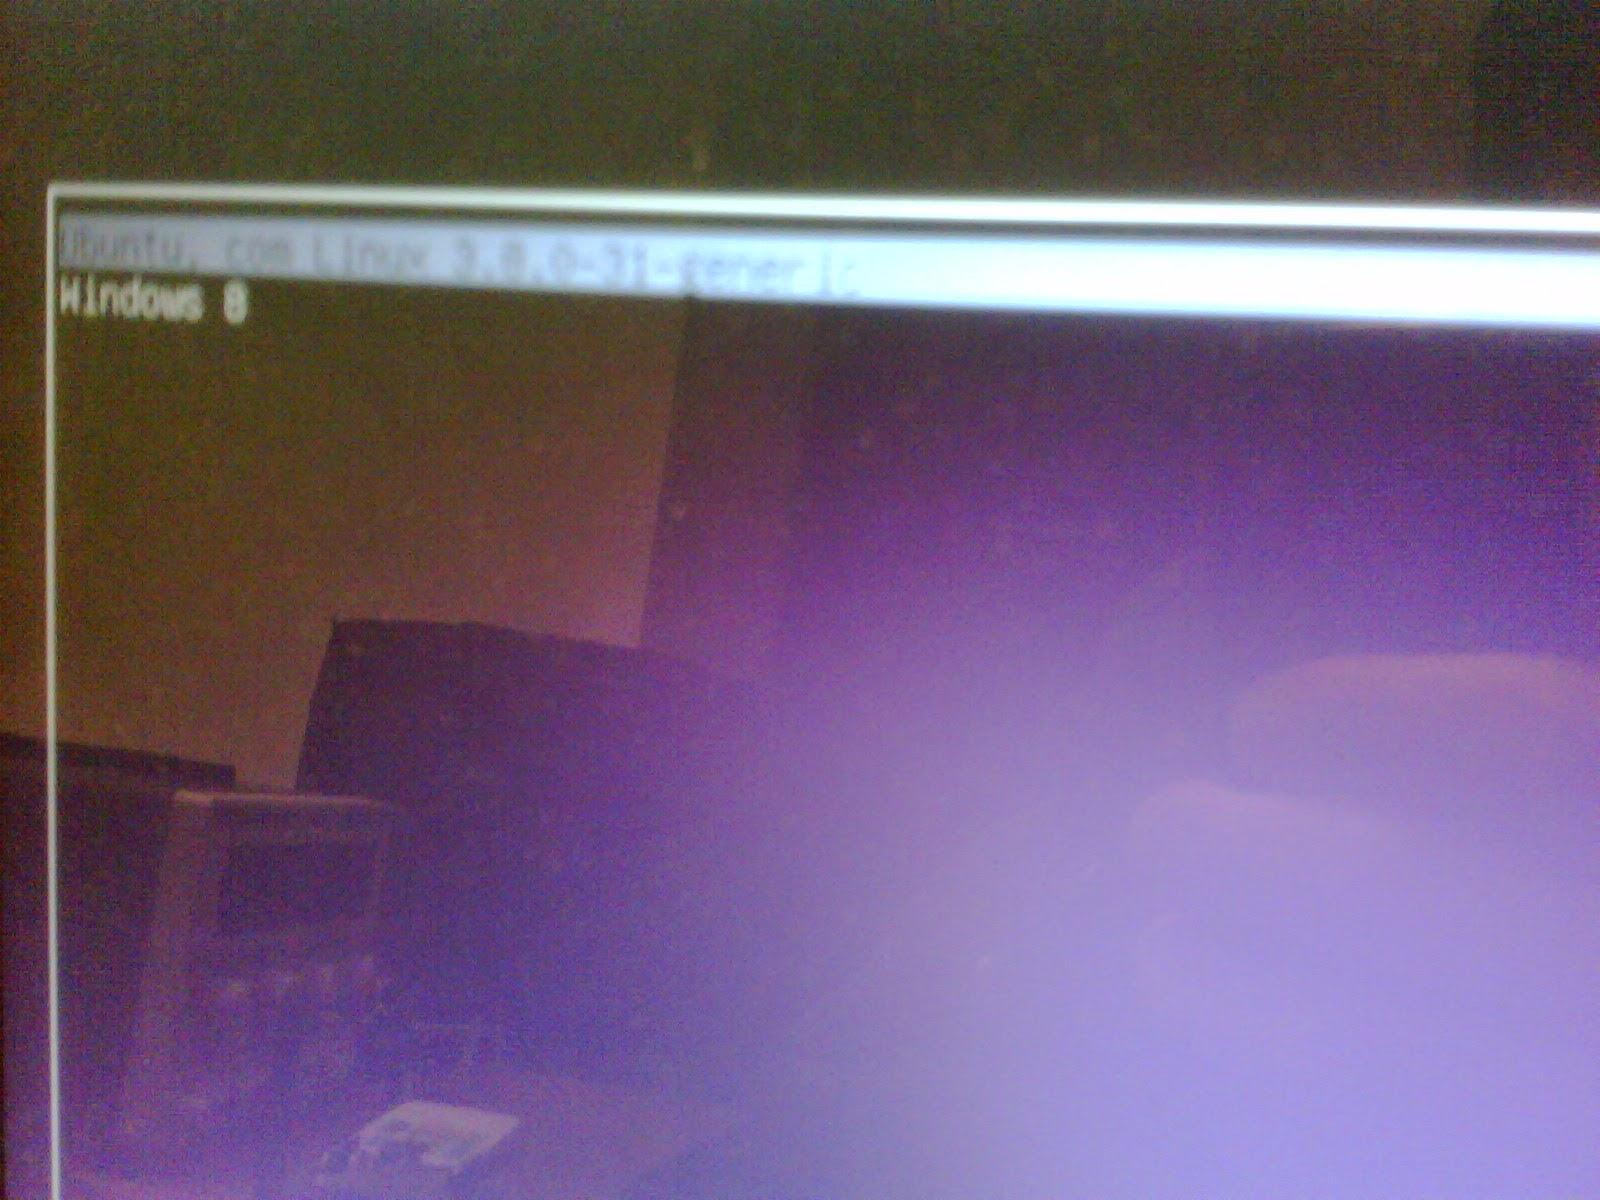 Dual Boot Ubuntu and Windows 8 UEFI – eLab | hackerspace